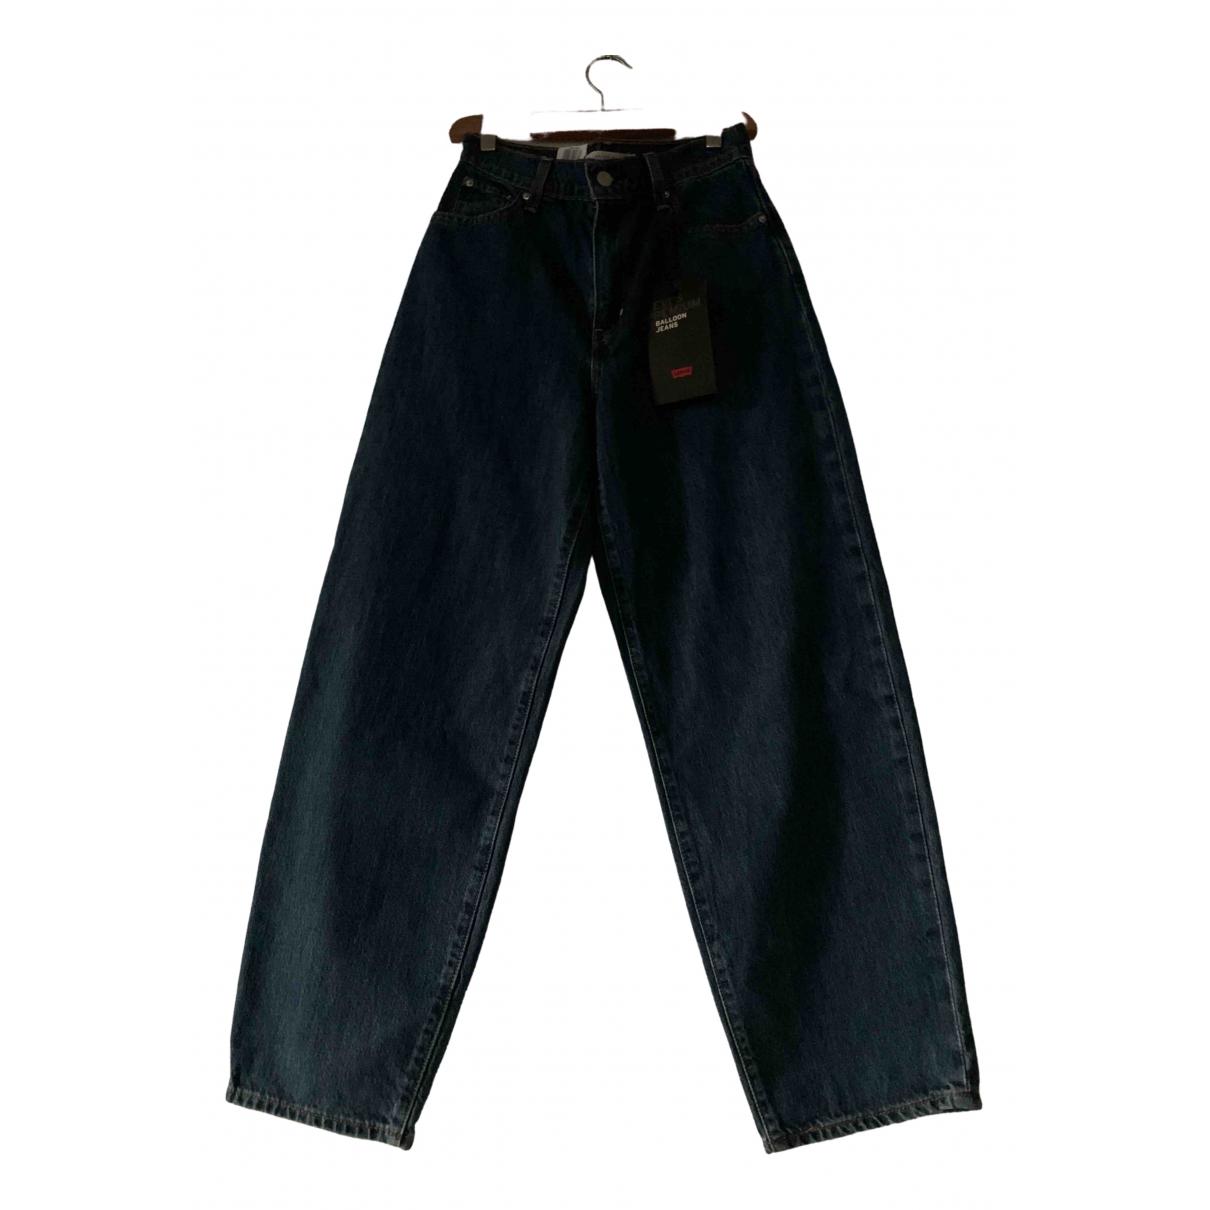 Levi's Balloon Blue Cotton Jeans for Women 26 US